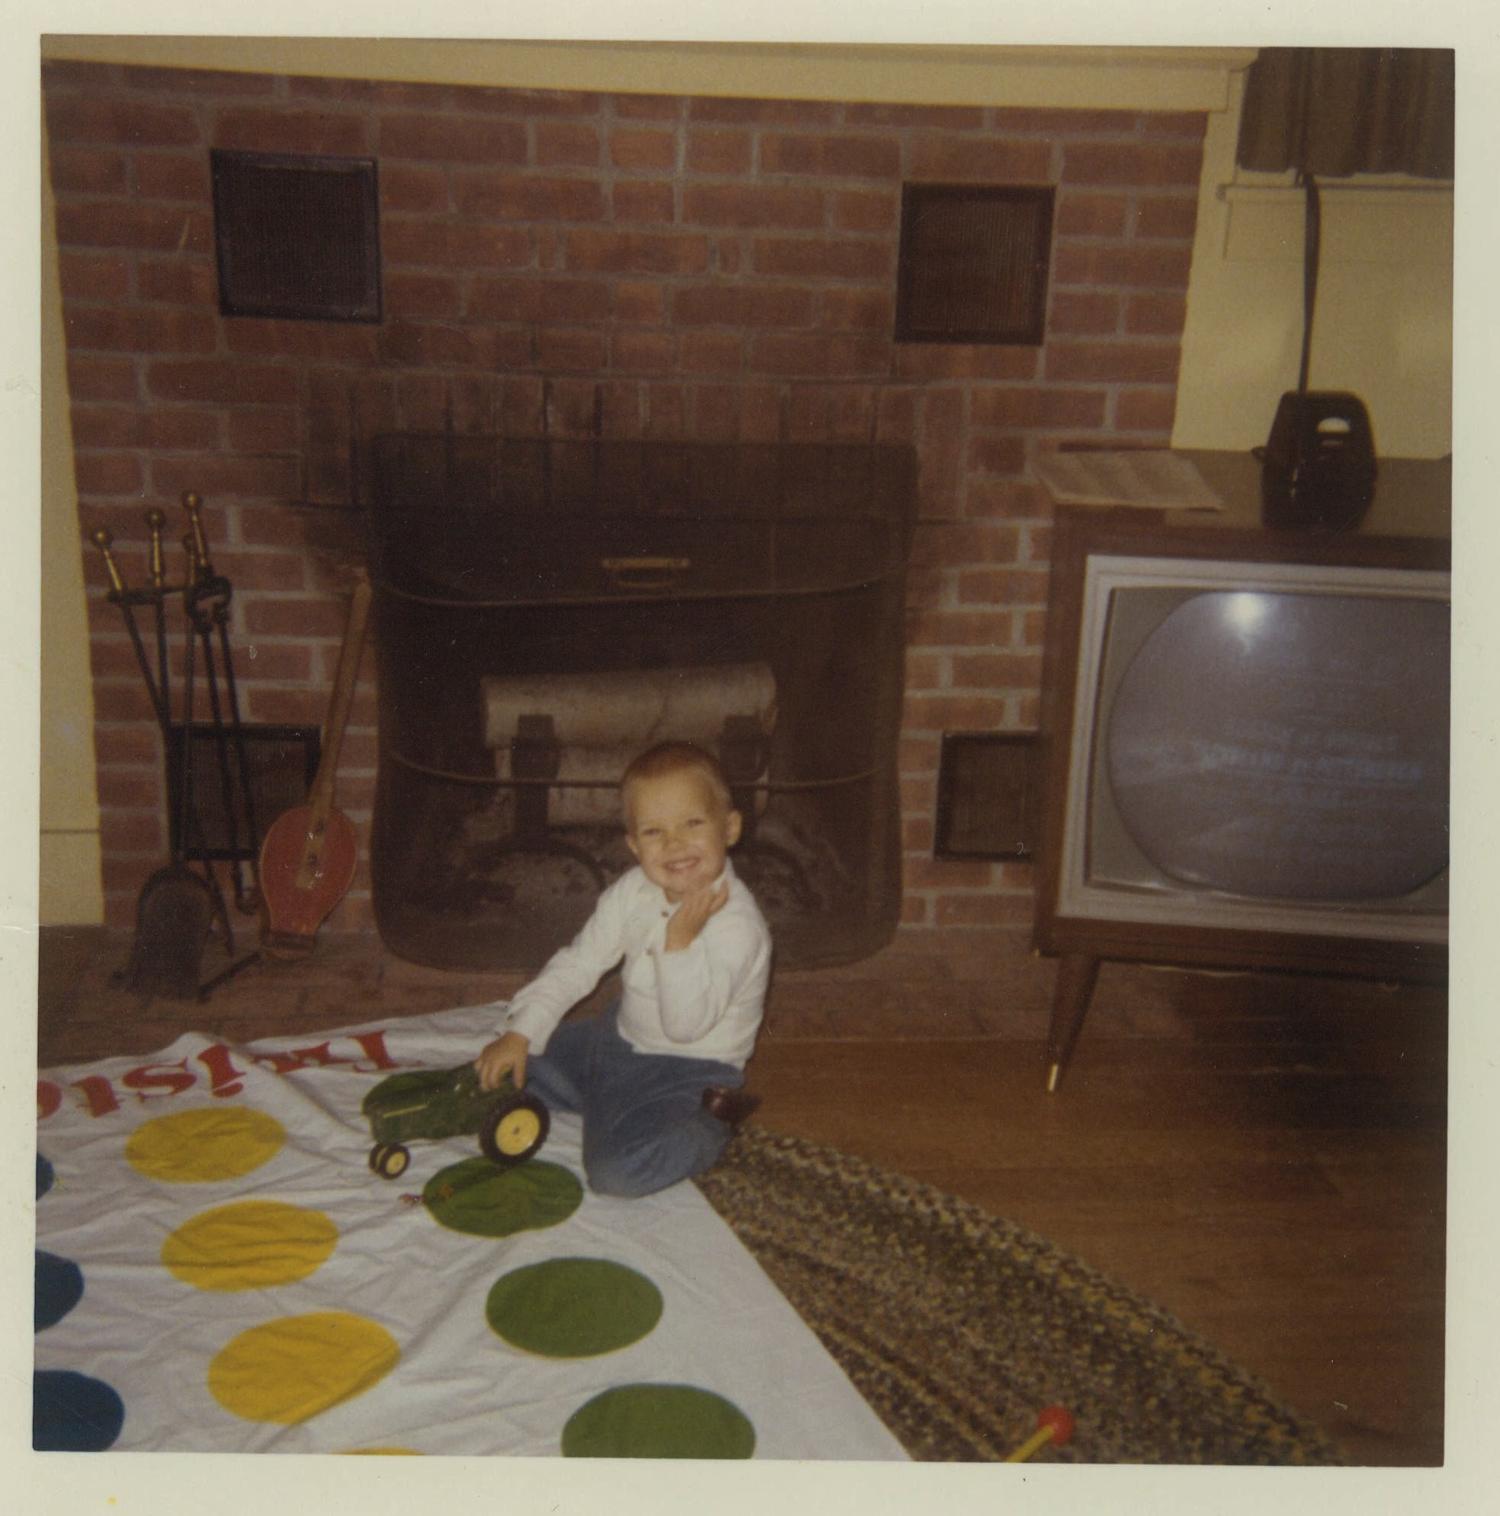 Jim Thanksgiving 1970sA.jpg